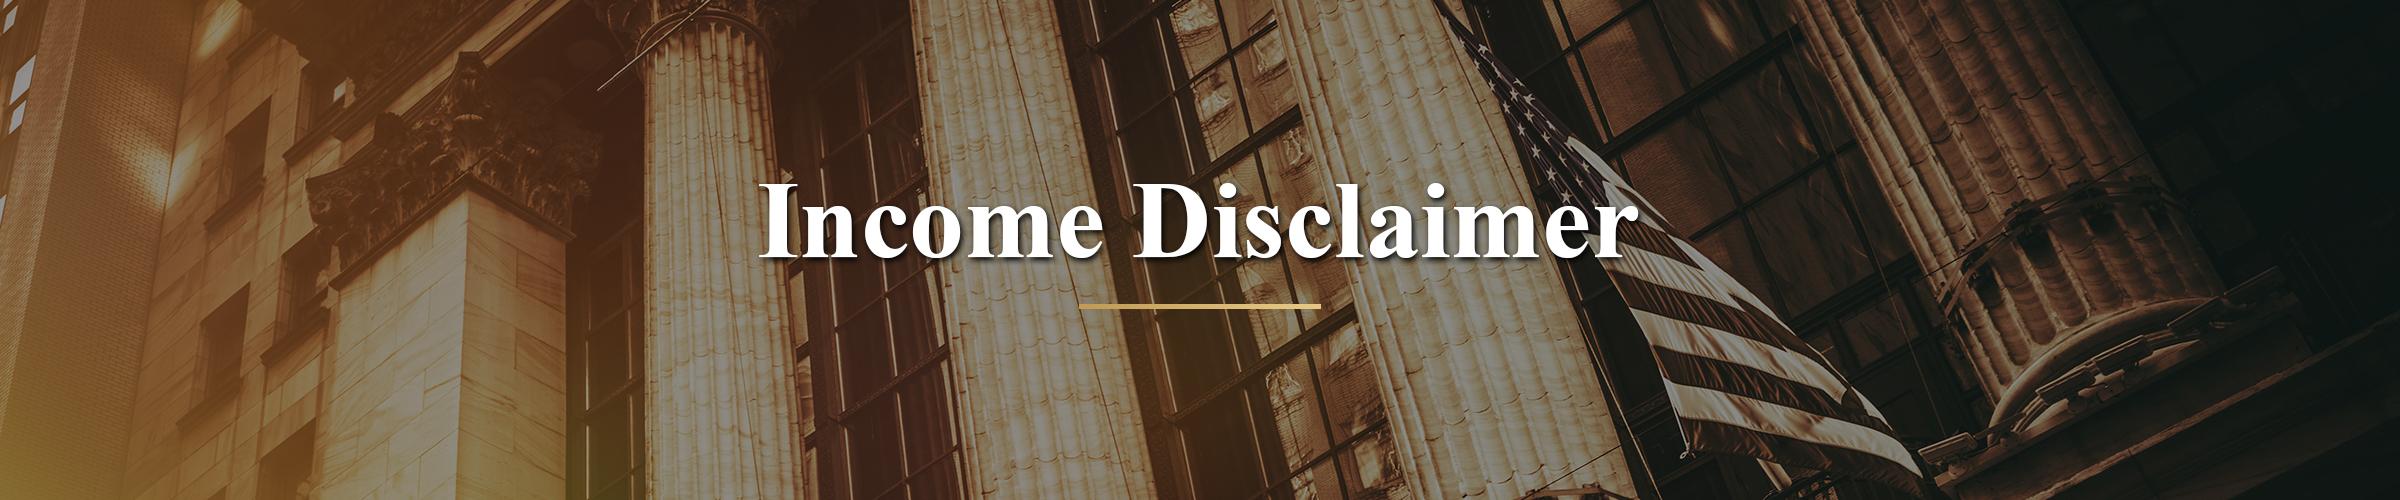 millionaireseries.com income disclaimer